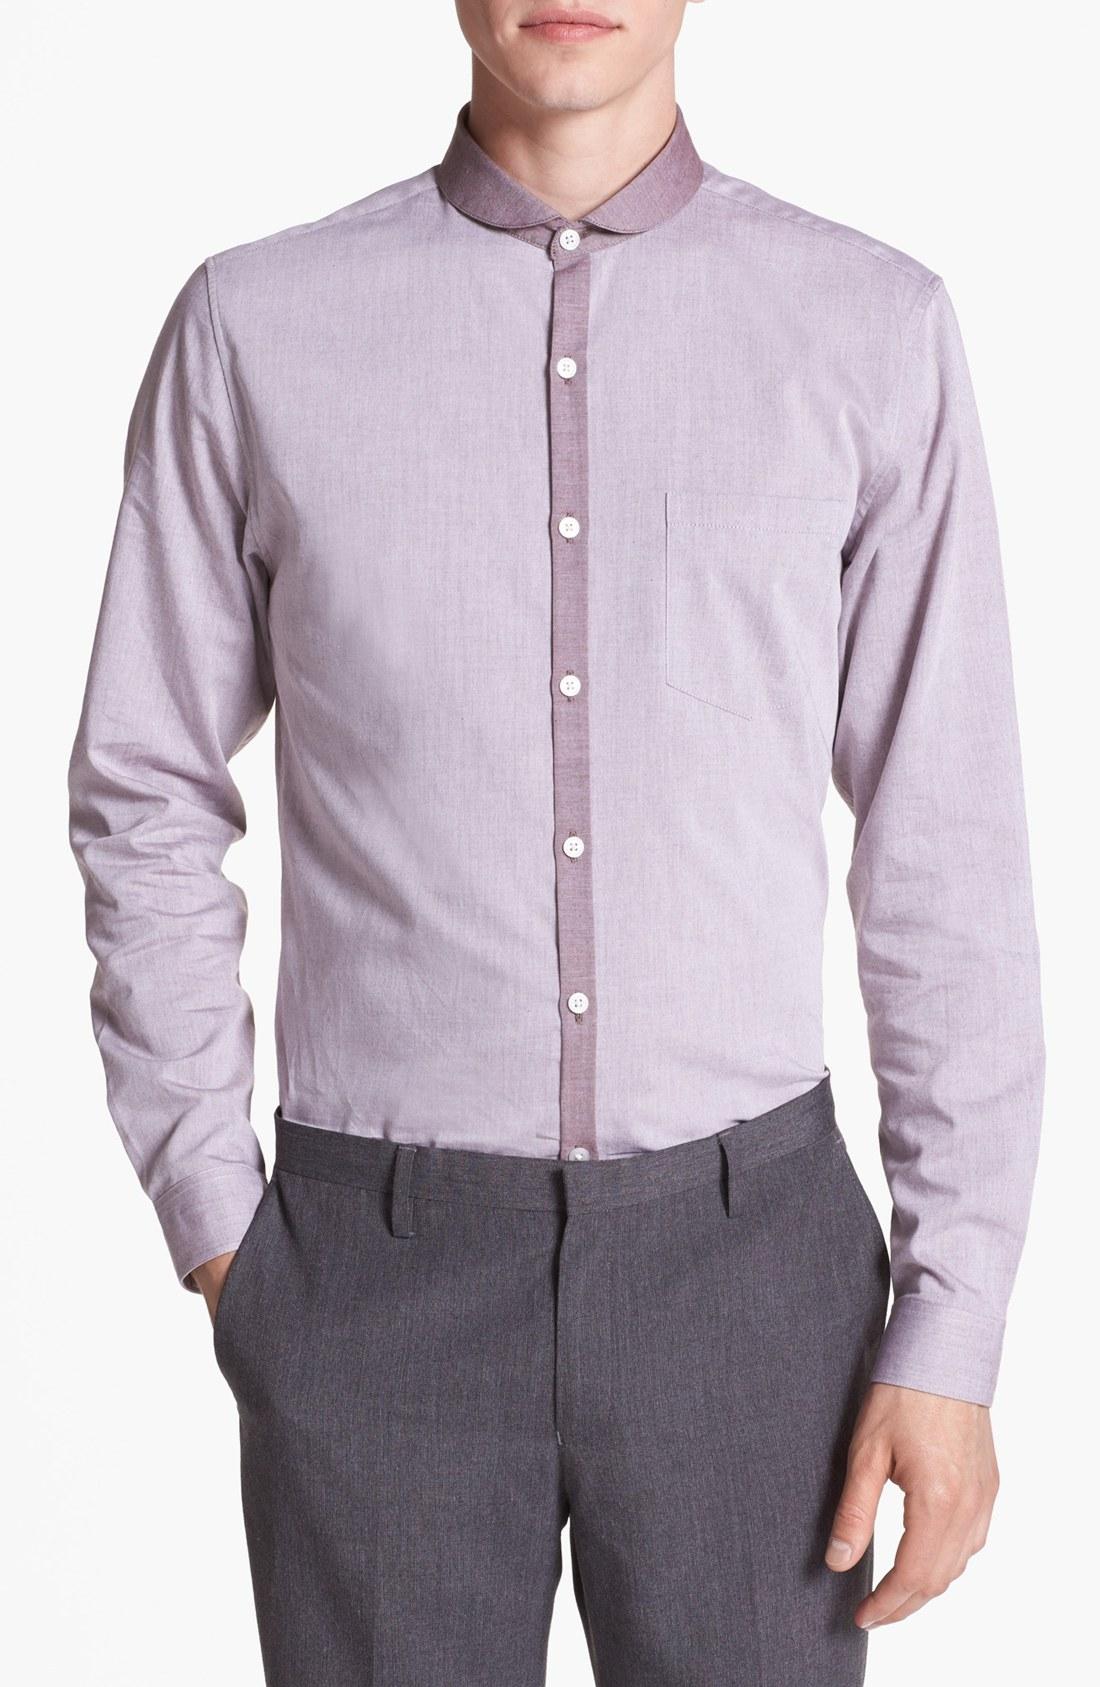 Topman round collar dress shirt in gray for men burgundy for Round collar shirt men